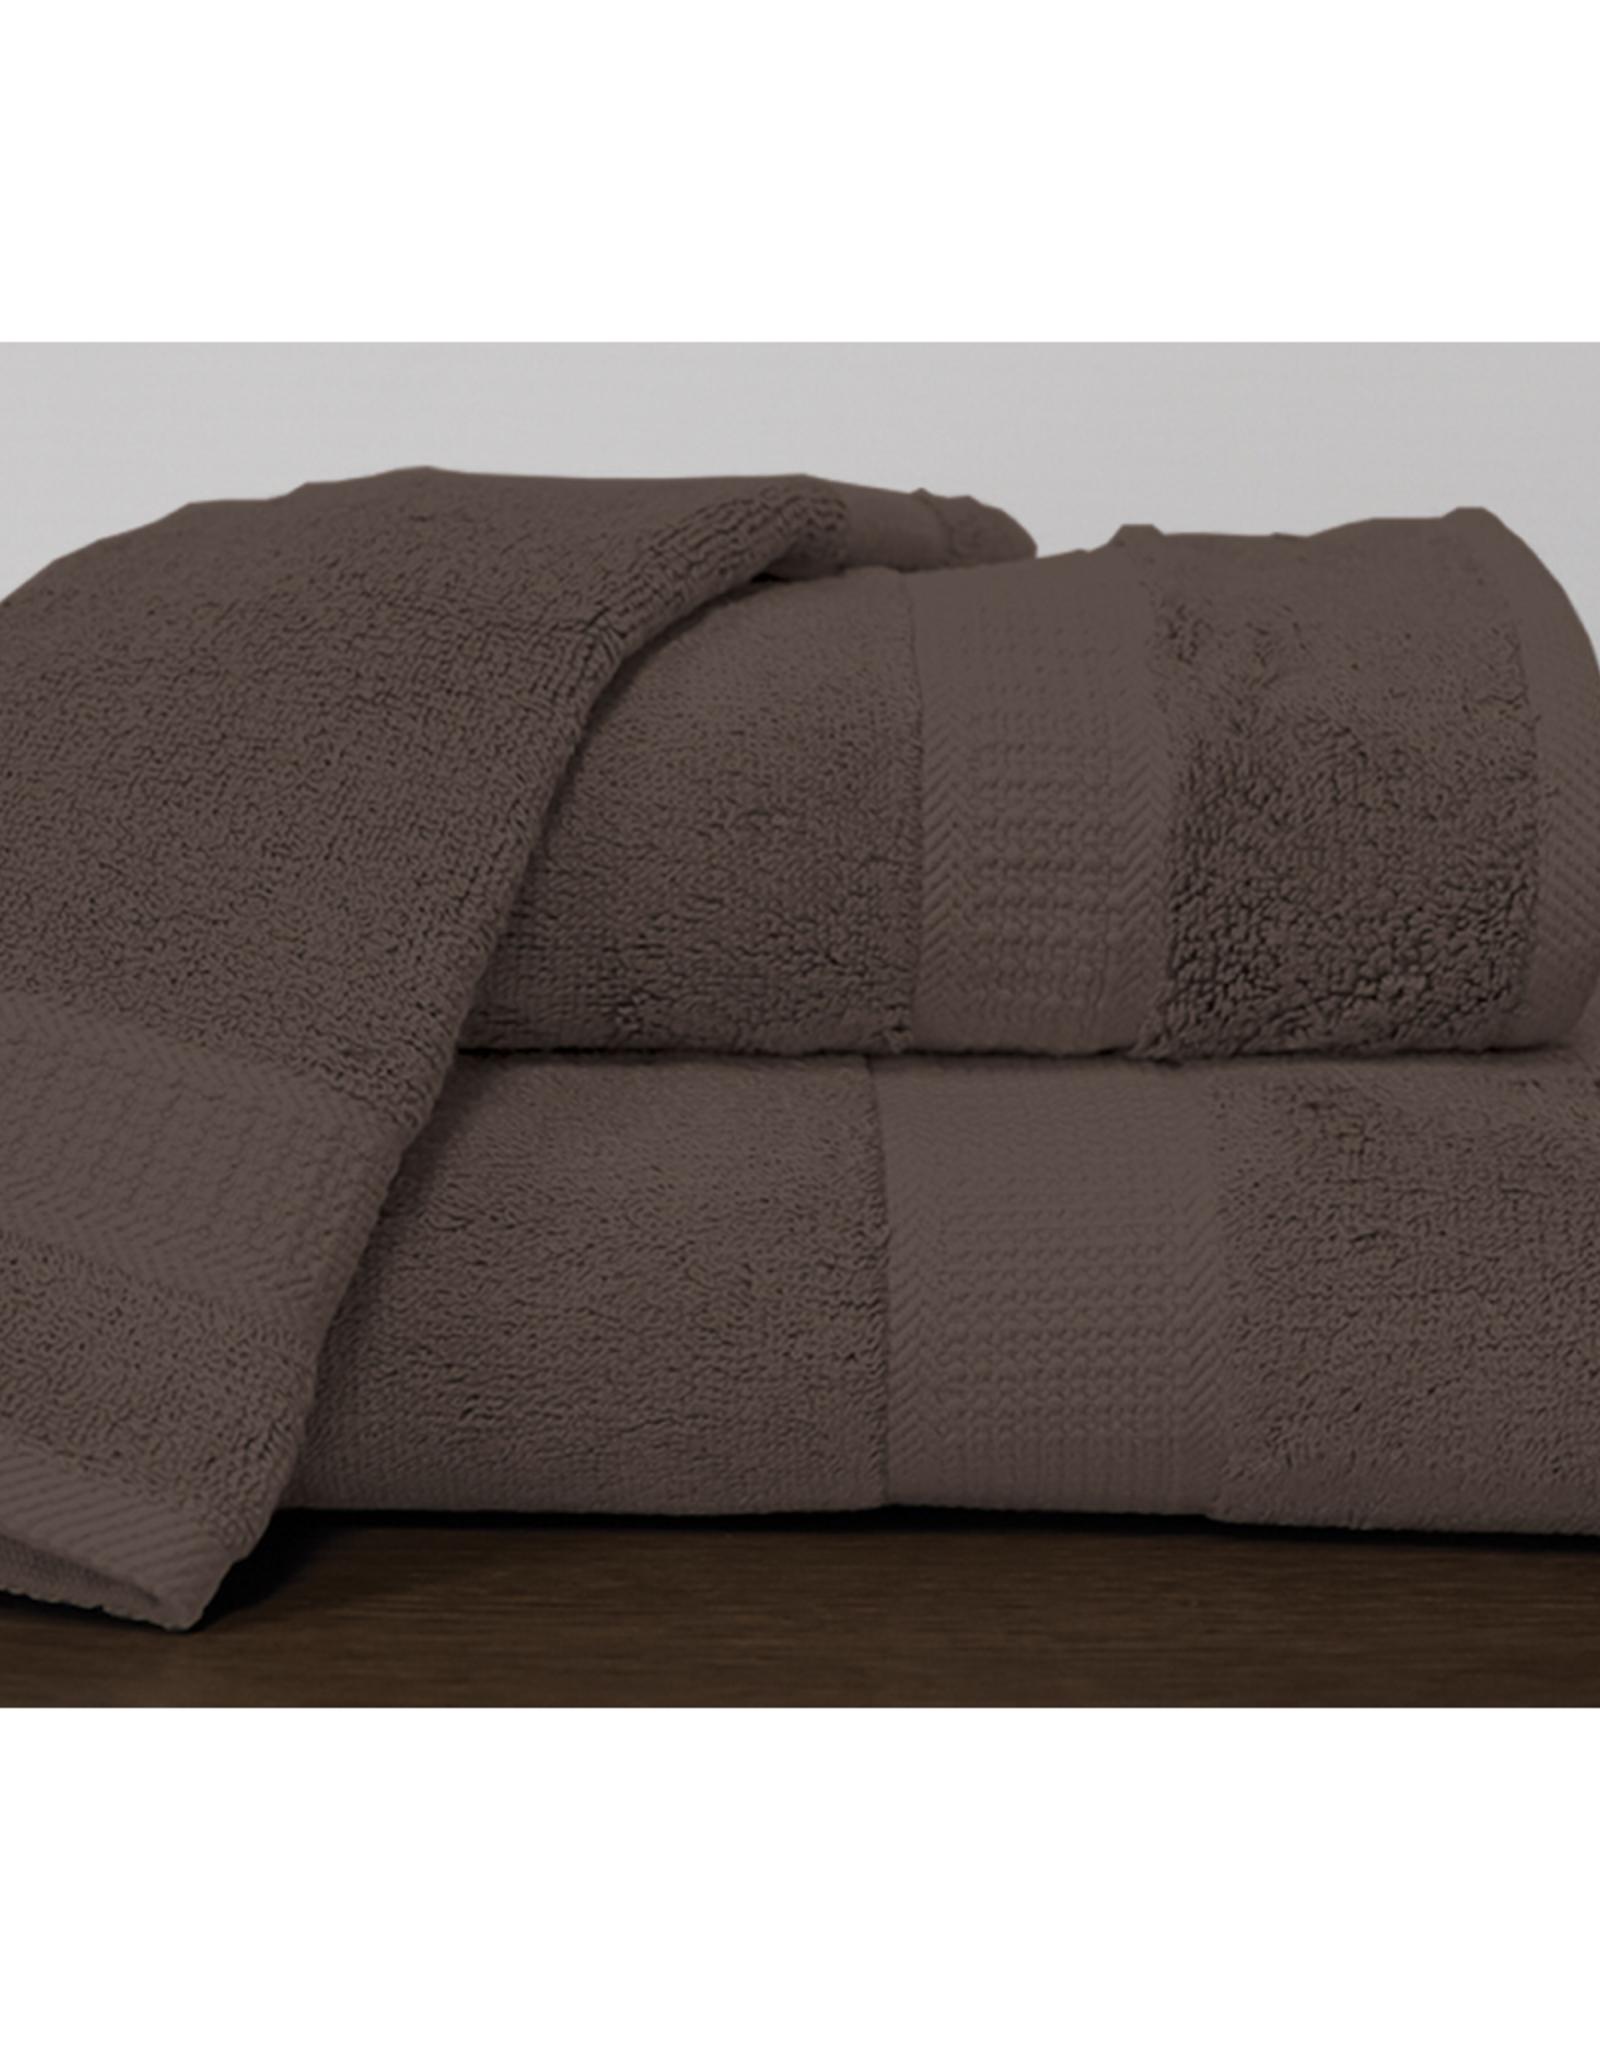 Alamode Home Bath Towel RJS Bamboo Oakwood